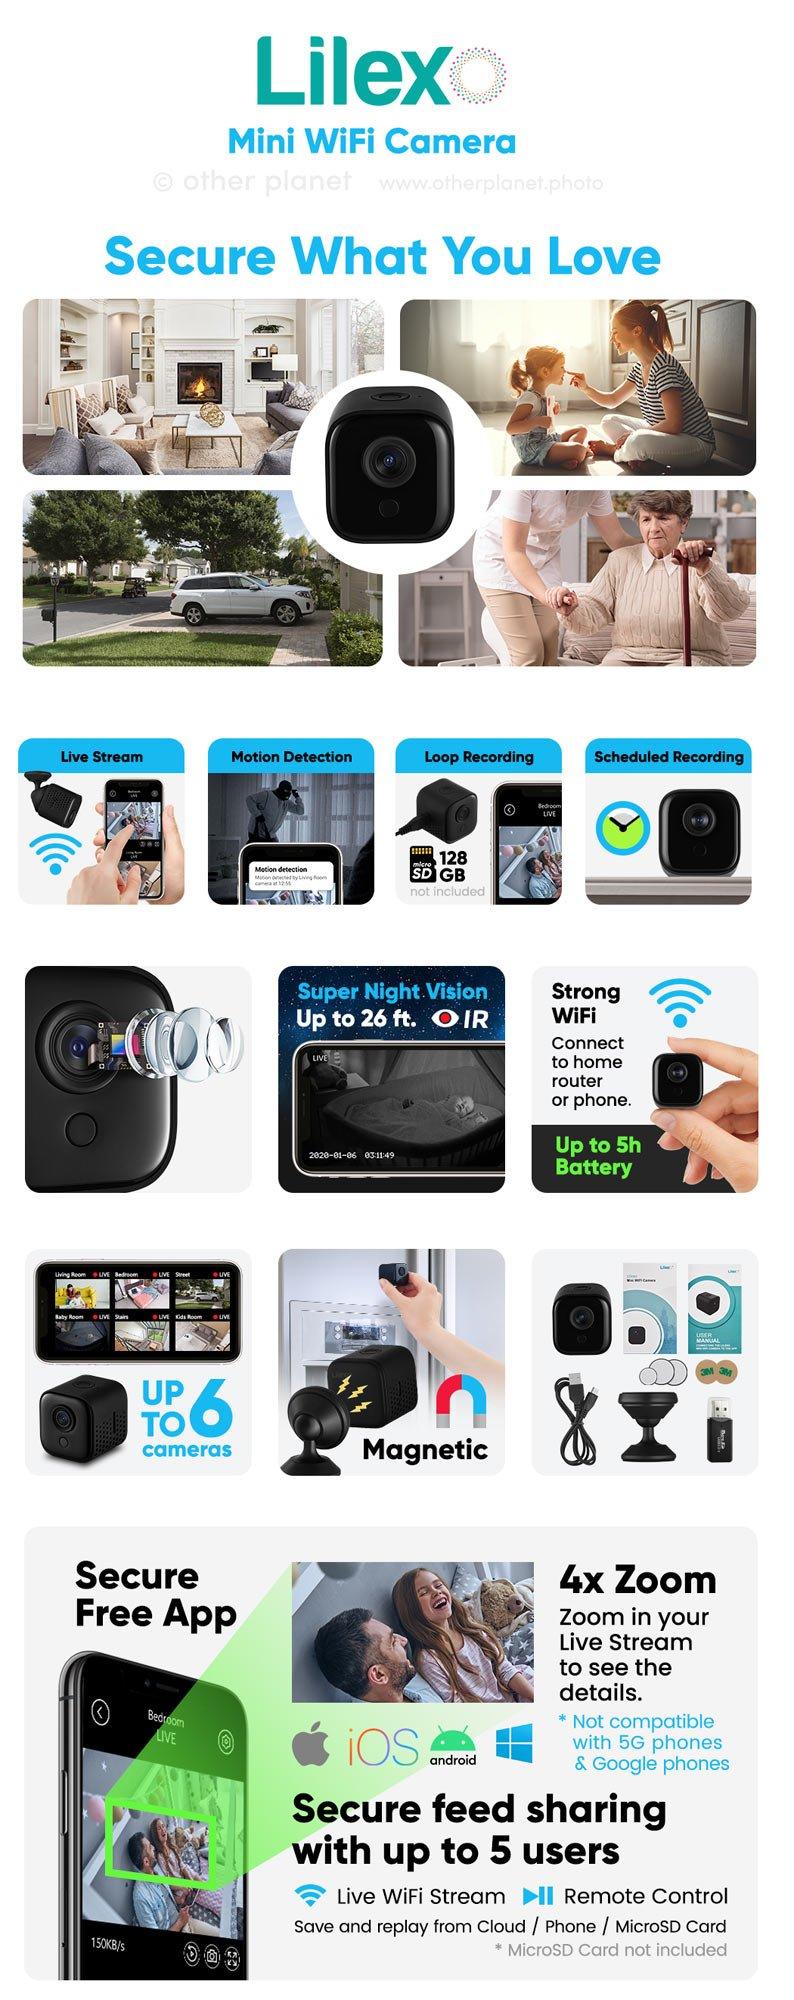 amazon product images for EBC for mini WiFi Camera